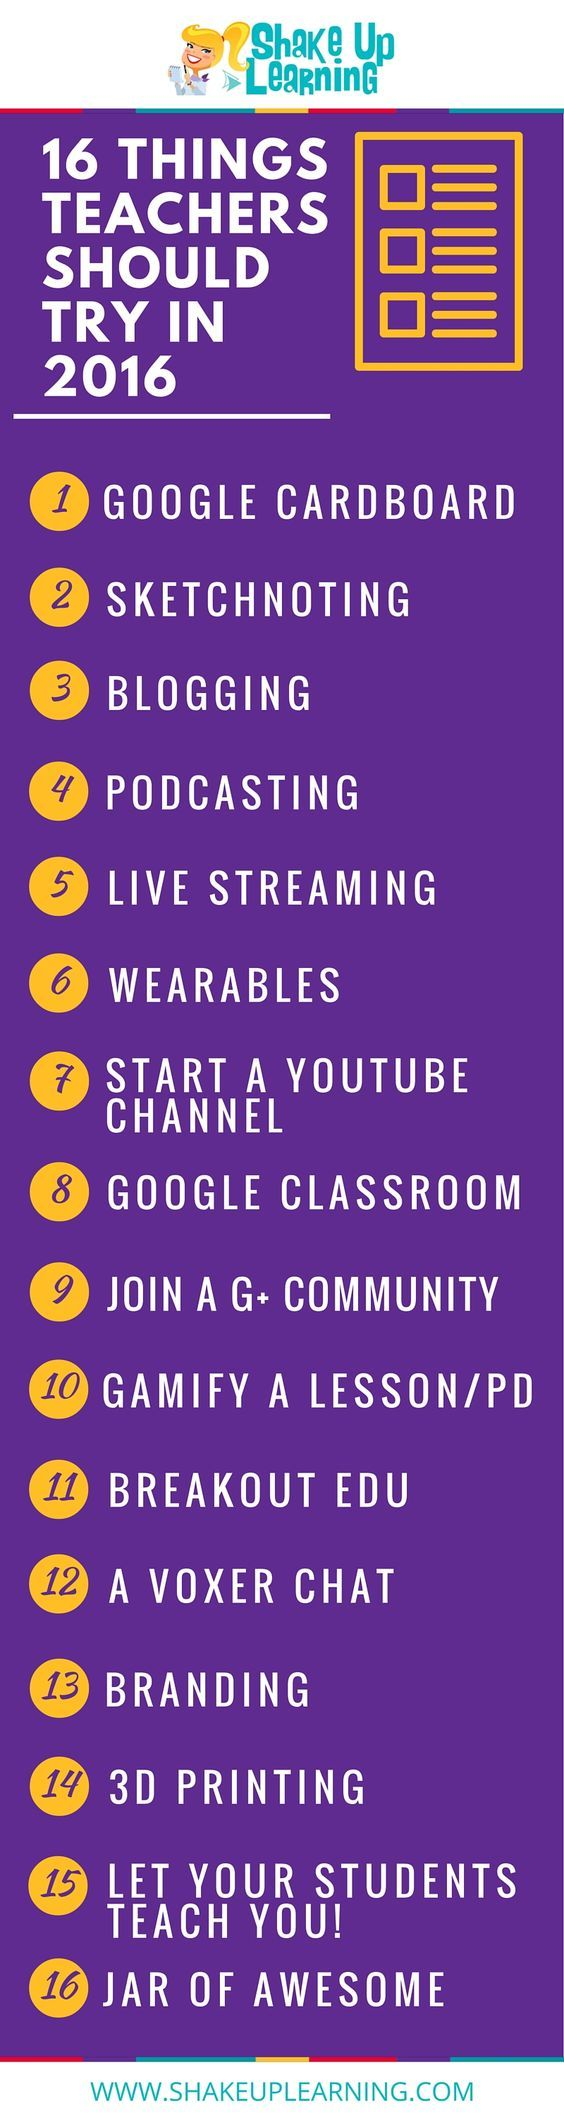 16 Things Teachers Should Try in 2016 [infographic] #GoogleEI #GoogleET